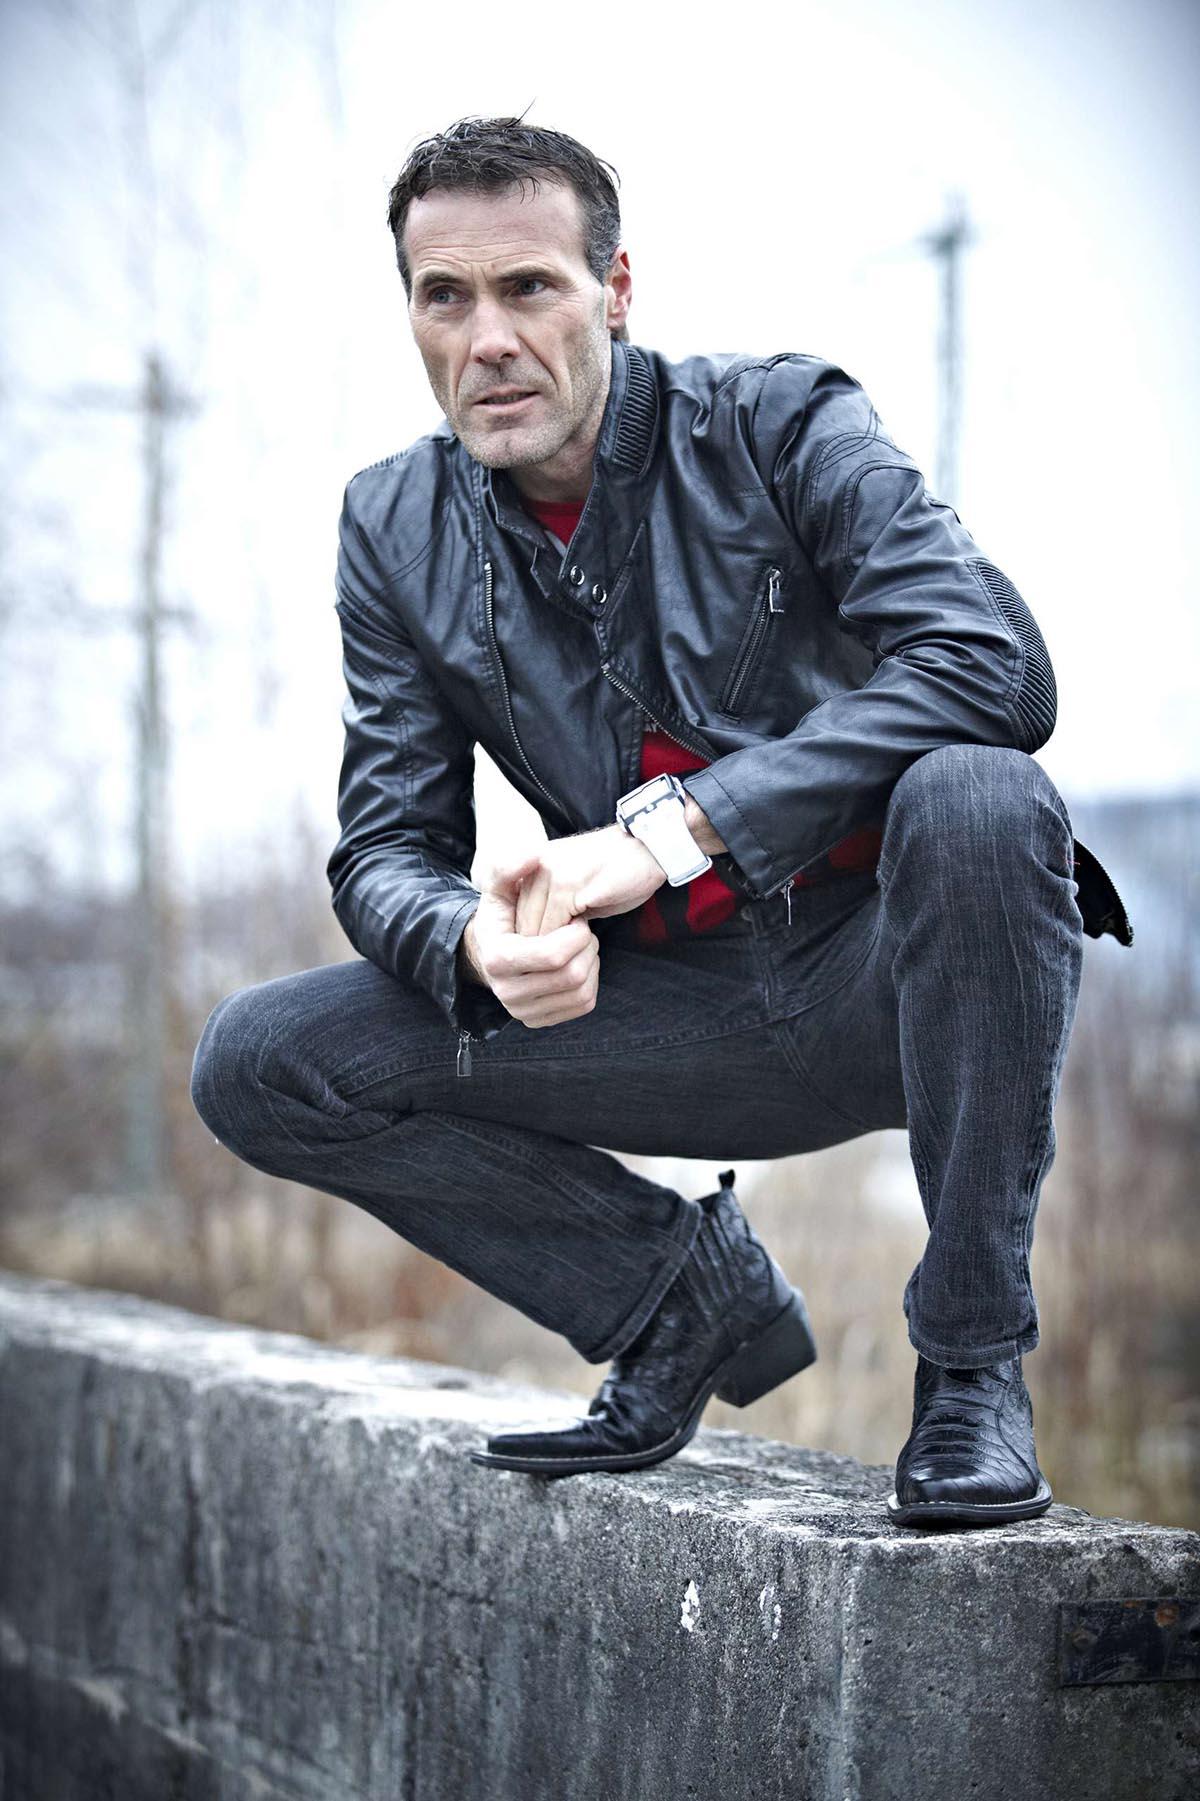 Mann, schwarze Lederjacke marc gilsdorf fotografie Ihr